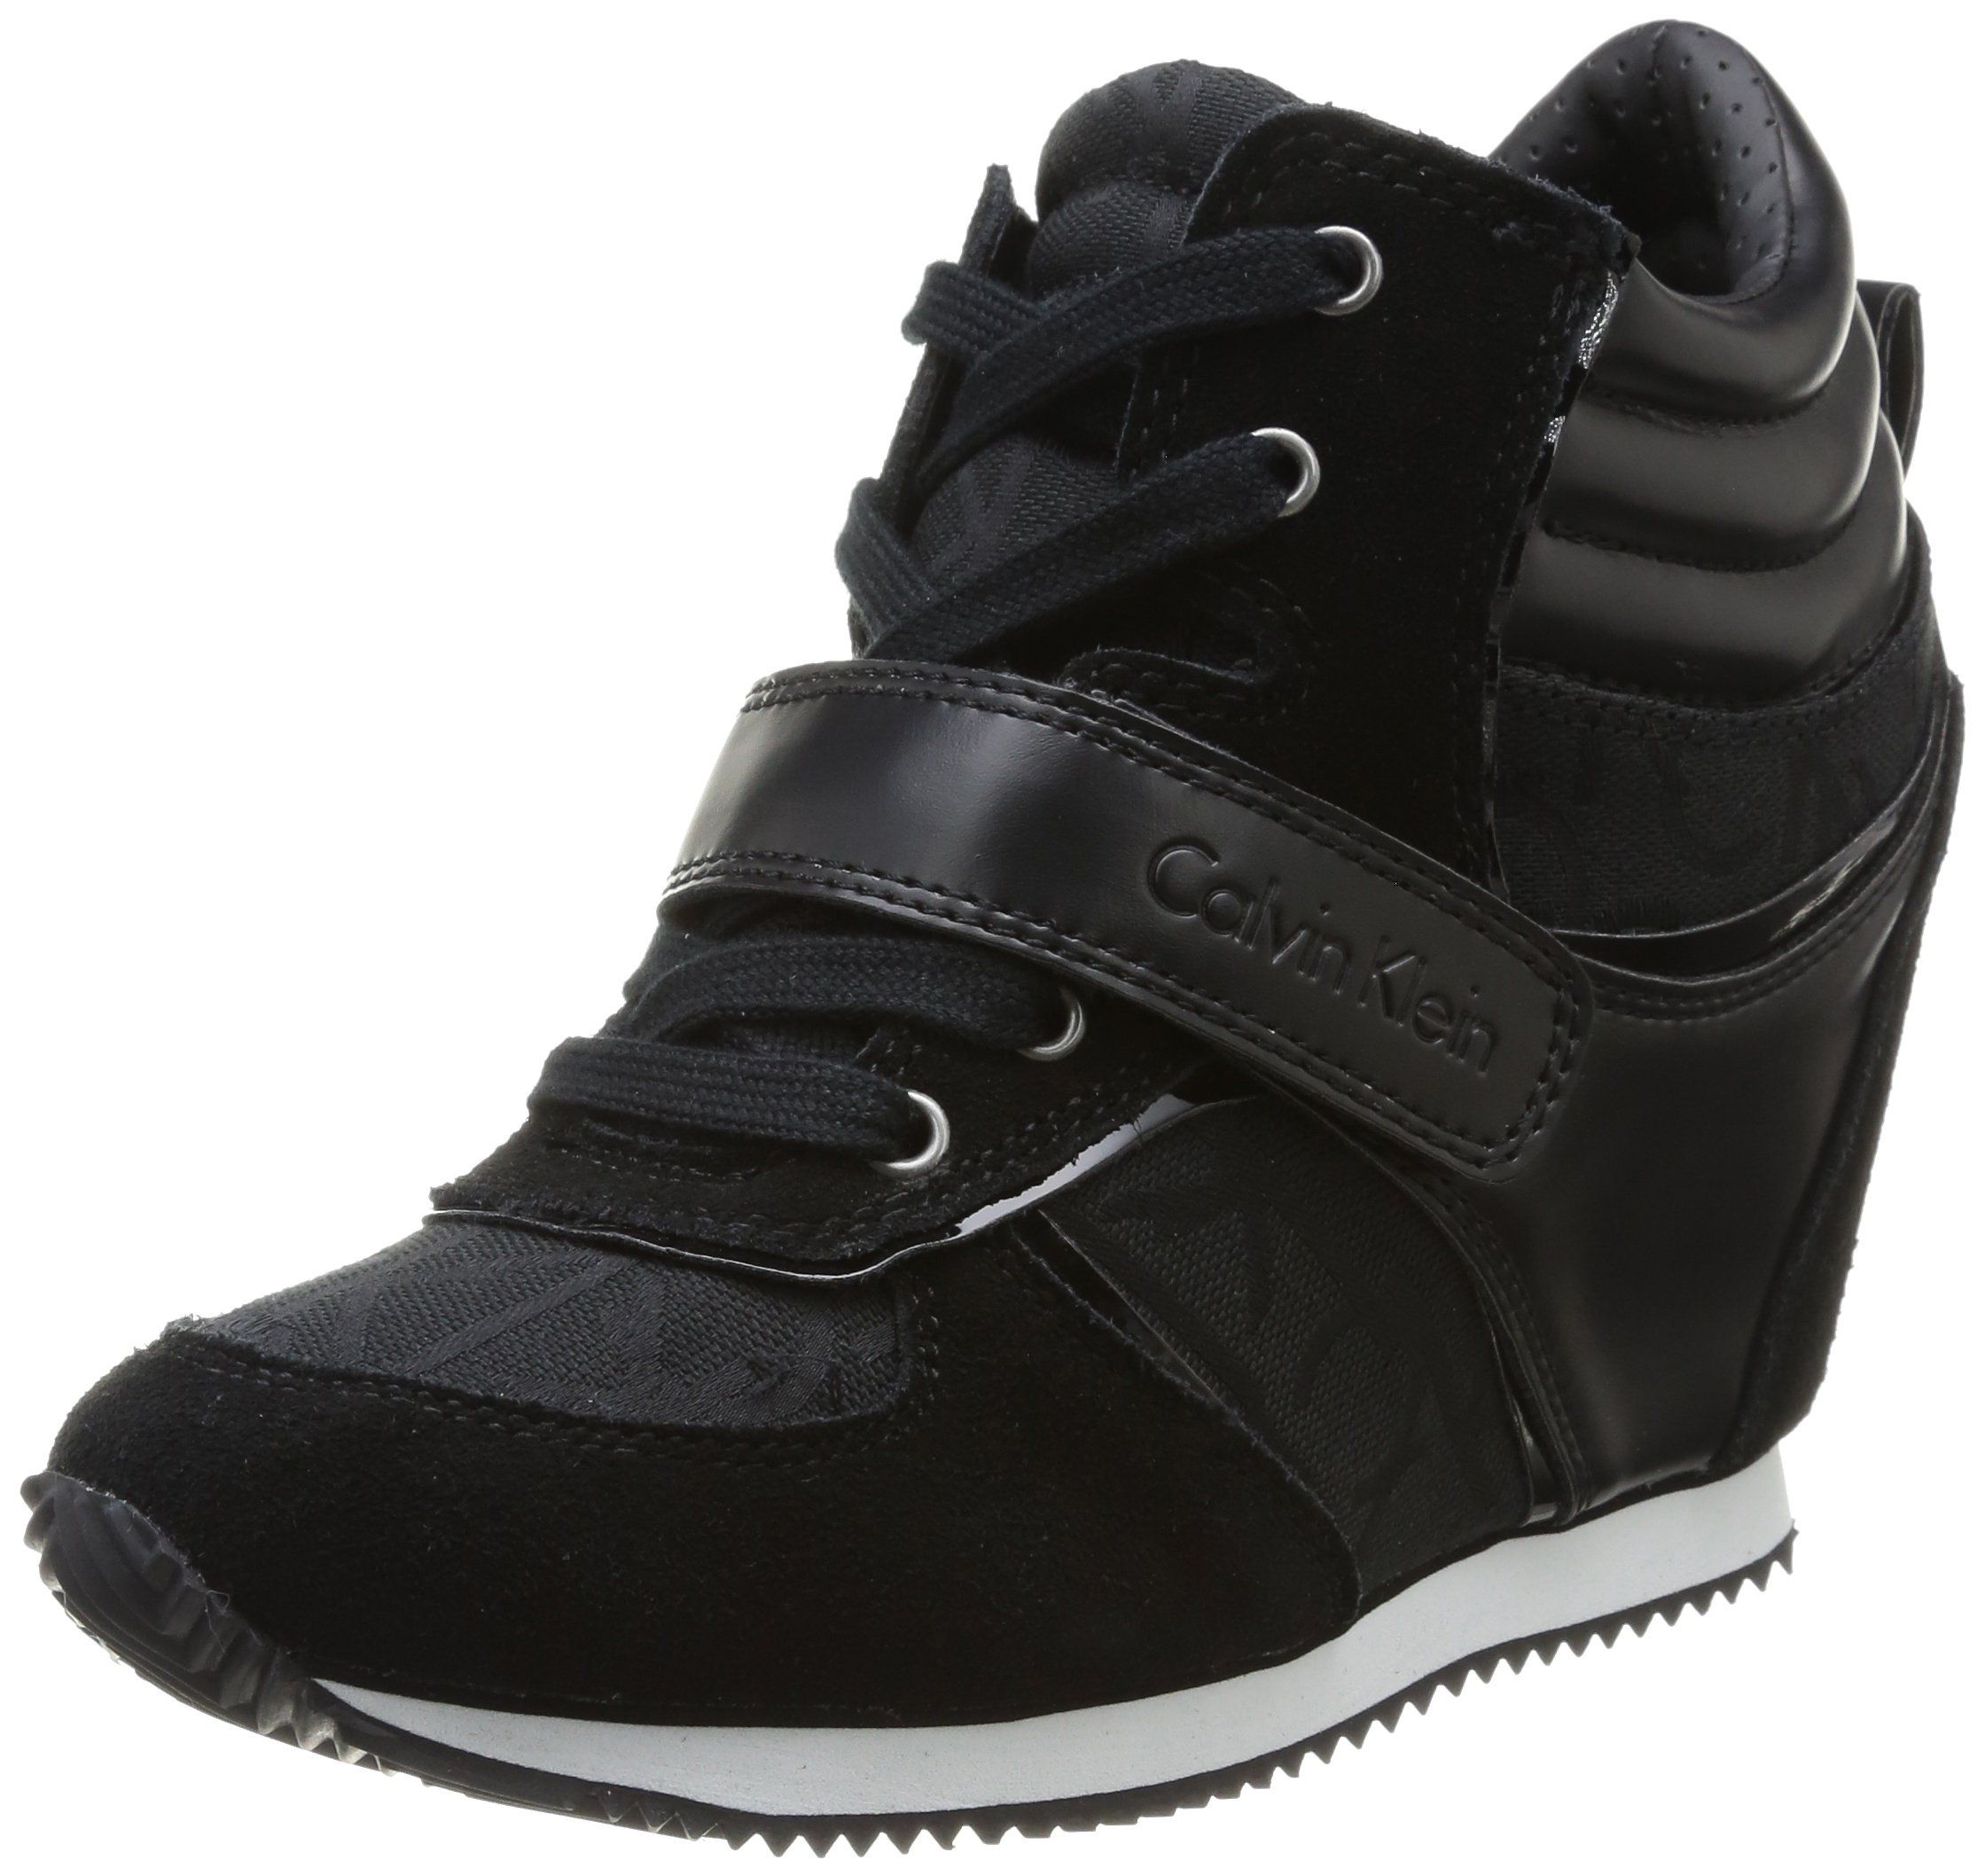 Dalila Soft Nappa, Sneakers Basses Femme, Noir (Black), 40 EUCalvin Klein Jeans